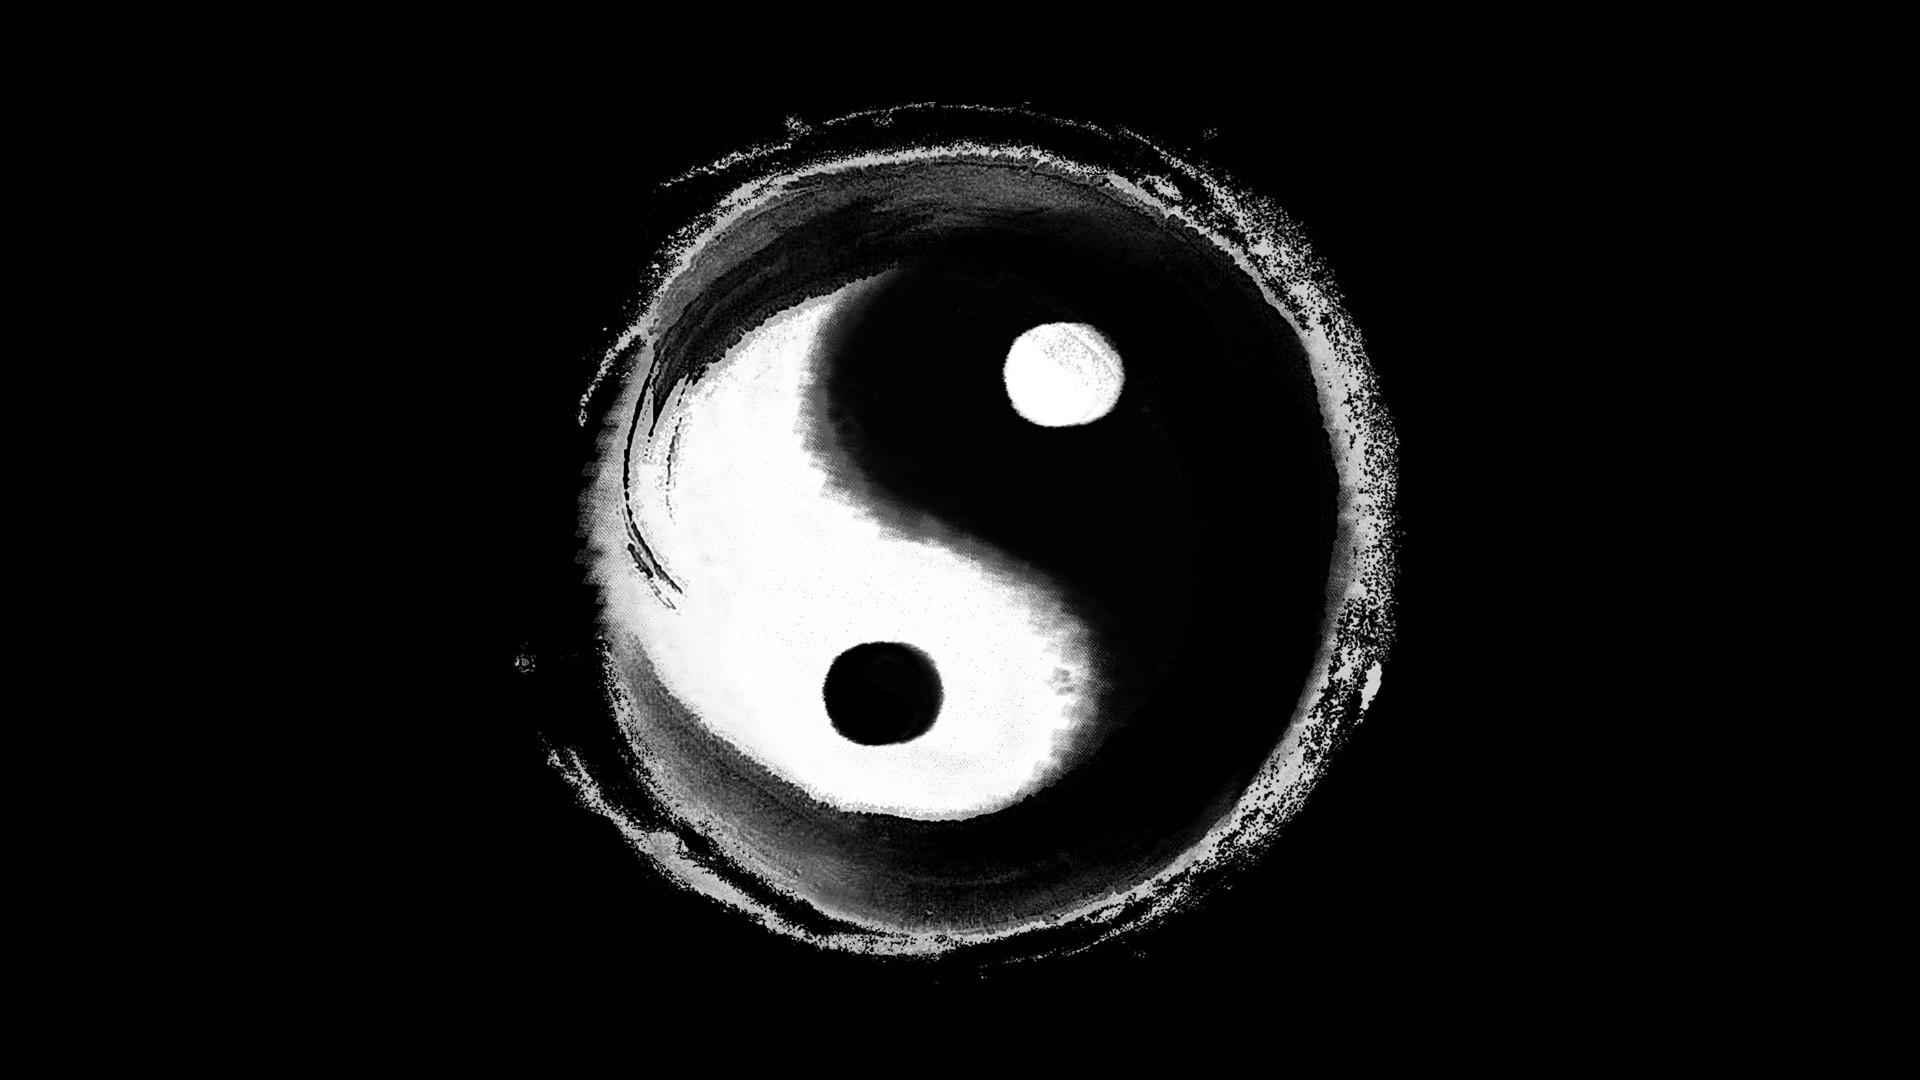 yin-yang-symbol-Google-Search-wallpaper-wpc90010878